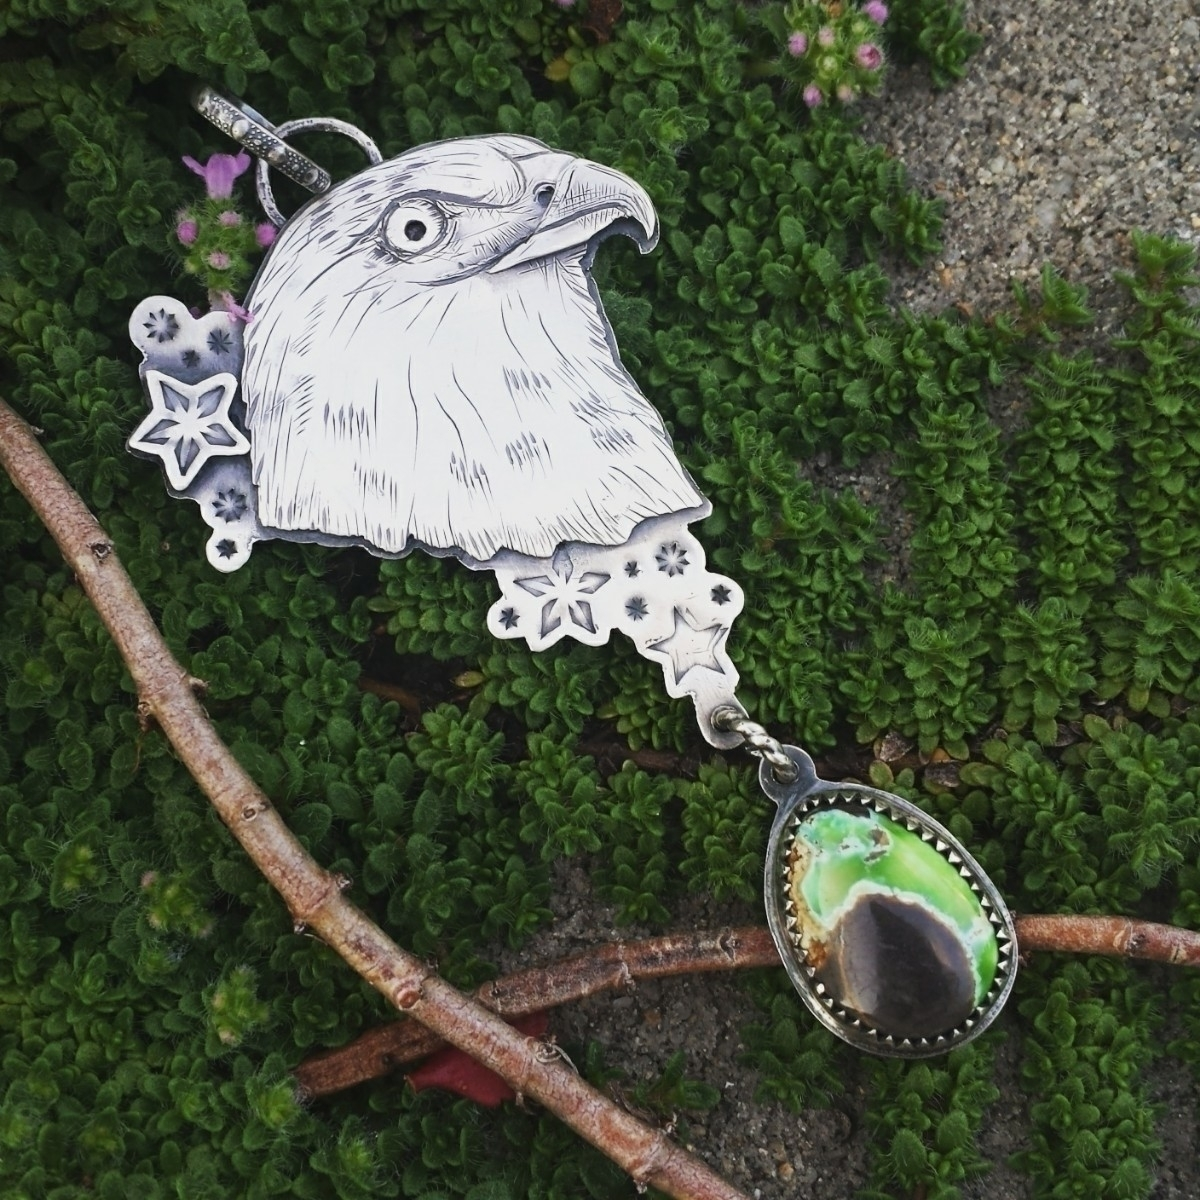 Hand engraved hawk pendant gorg - alleyec | ello